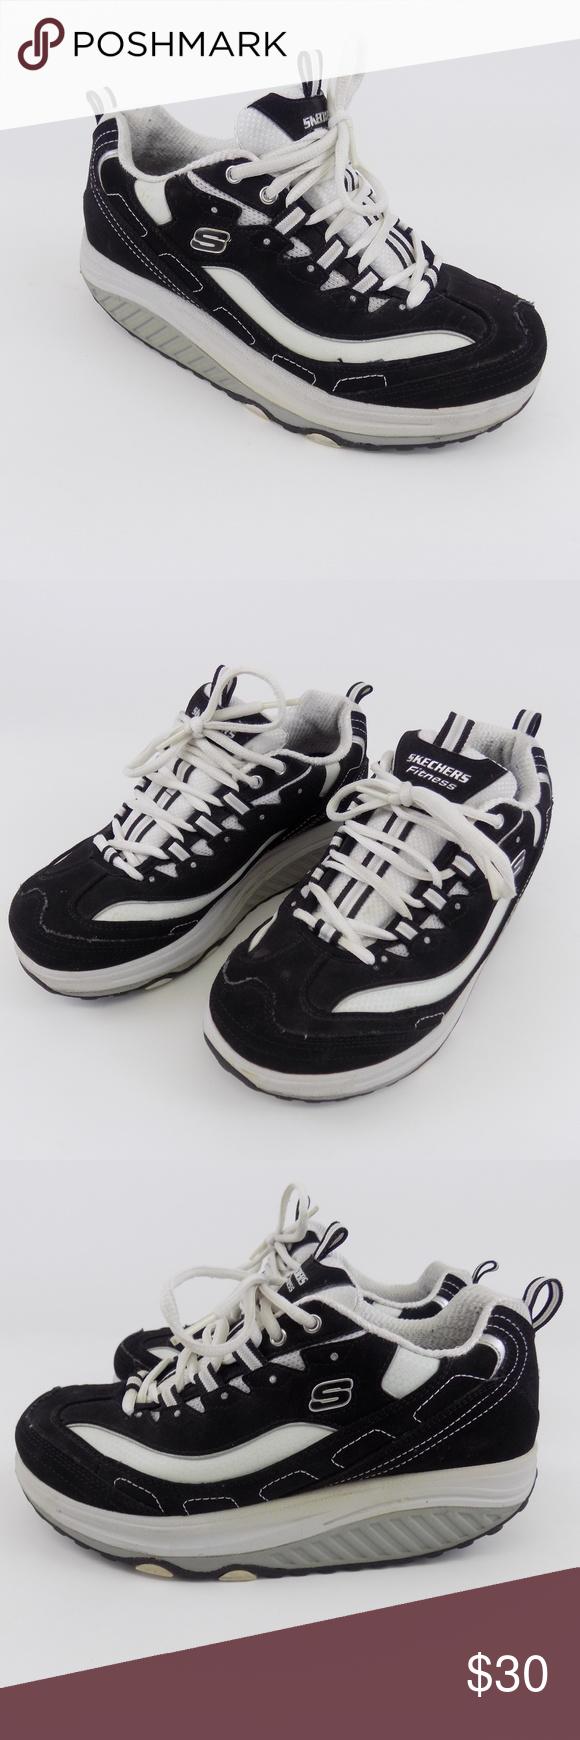 Skechers shape ups, Toning shoes, Skechers